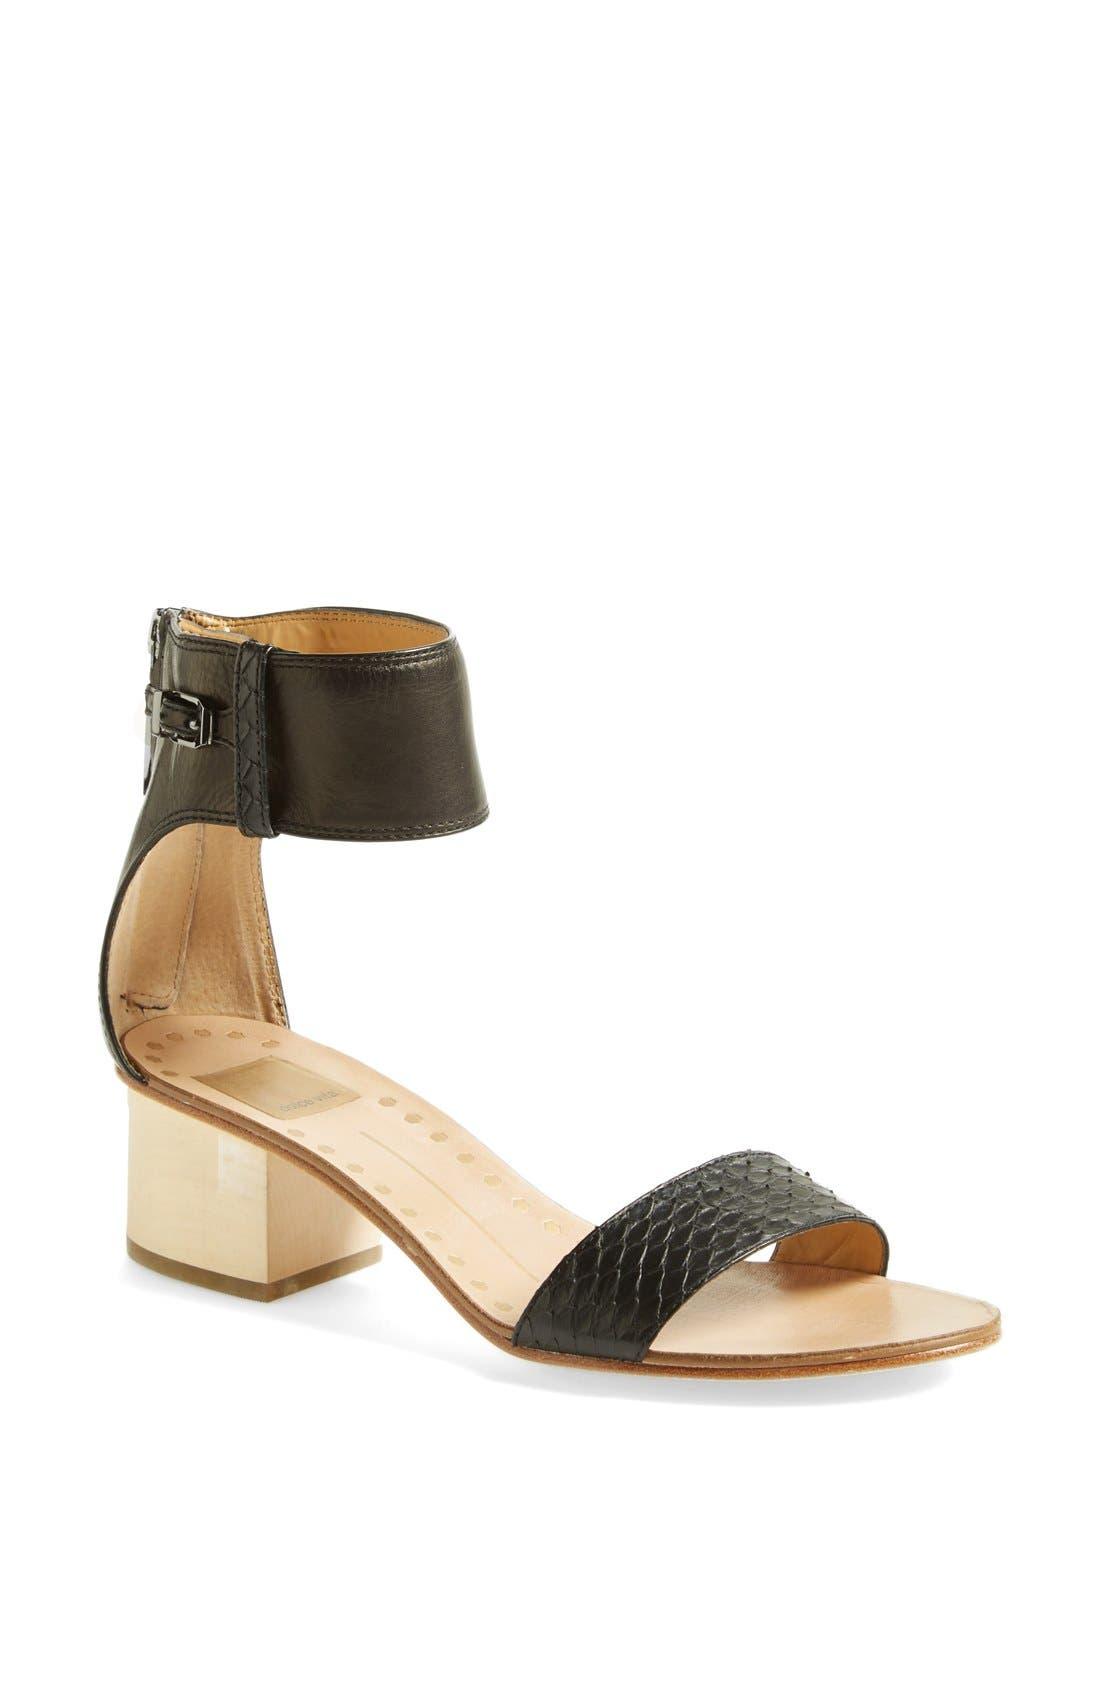 Main Image - Dolce Vita 'Foxie' Snakeskin & Leather Sandal